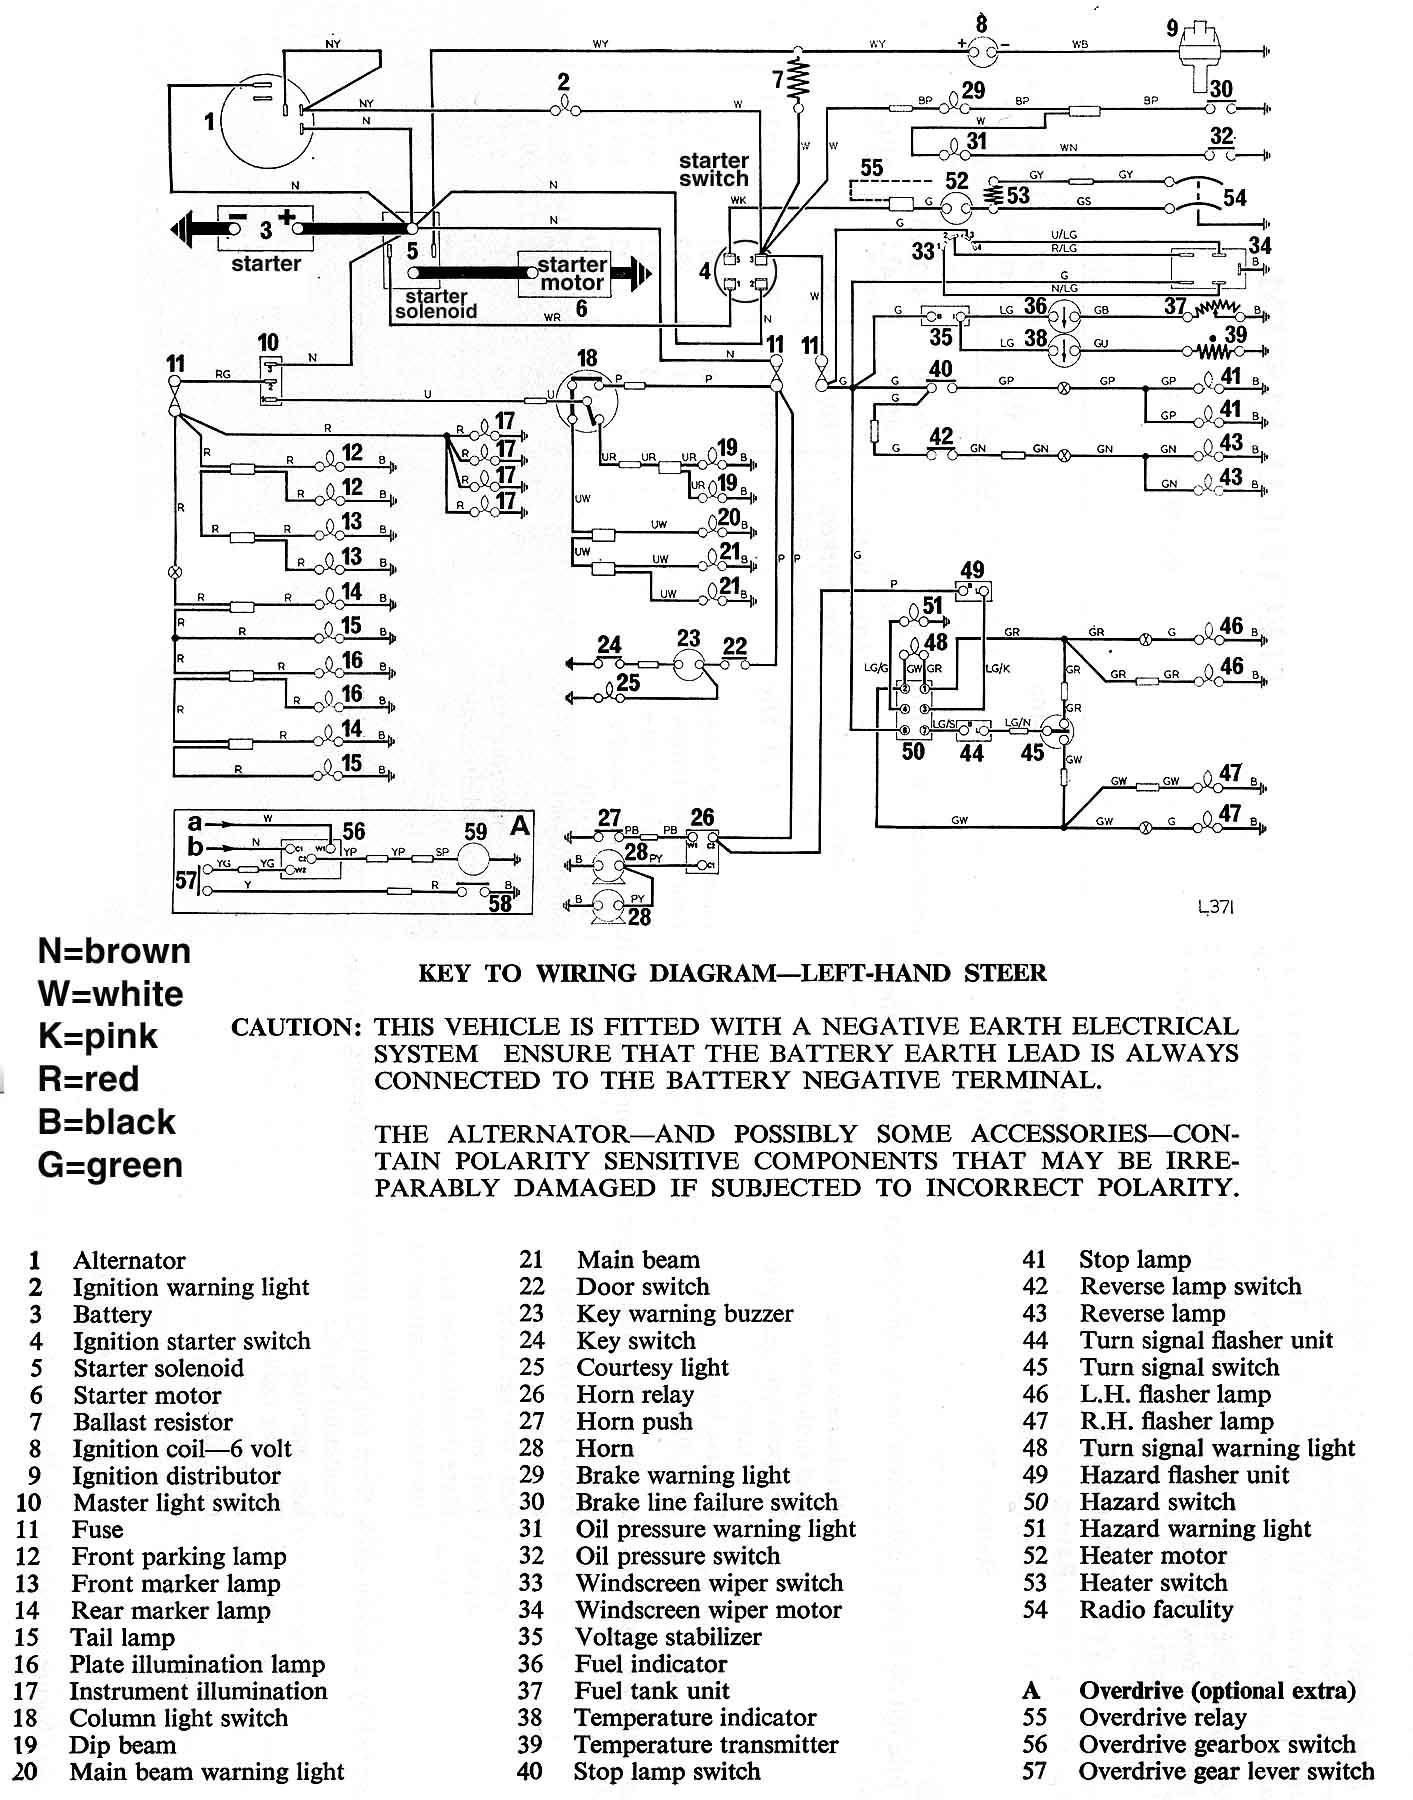 Spitfire/GT6 Relay and Blinker Information